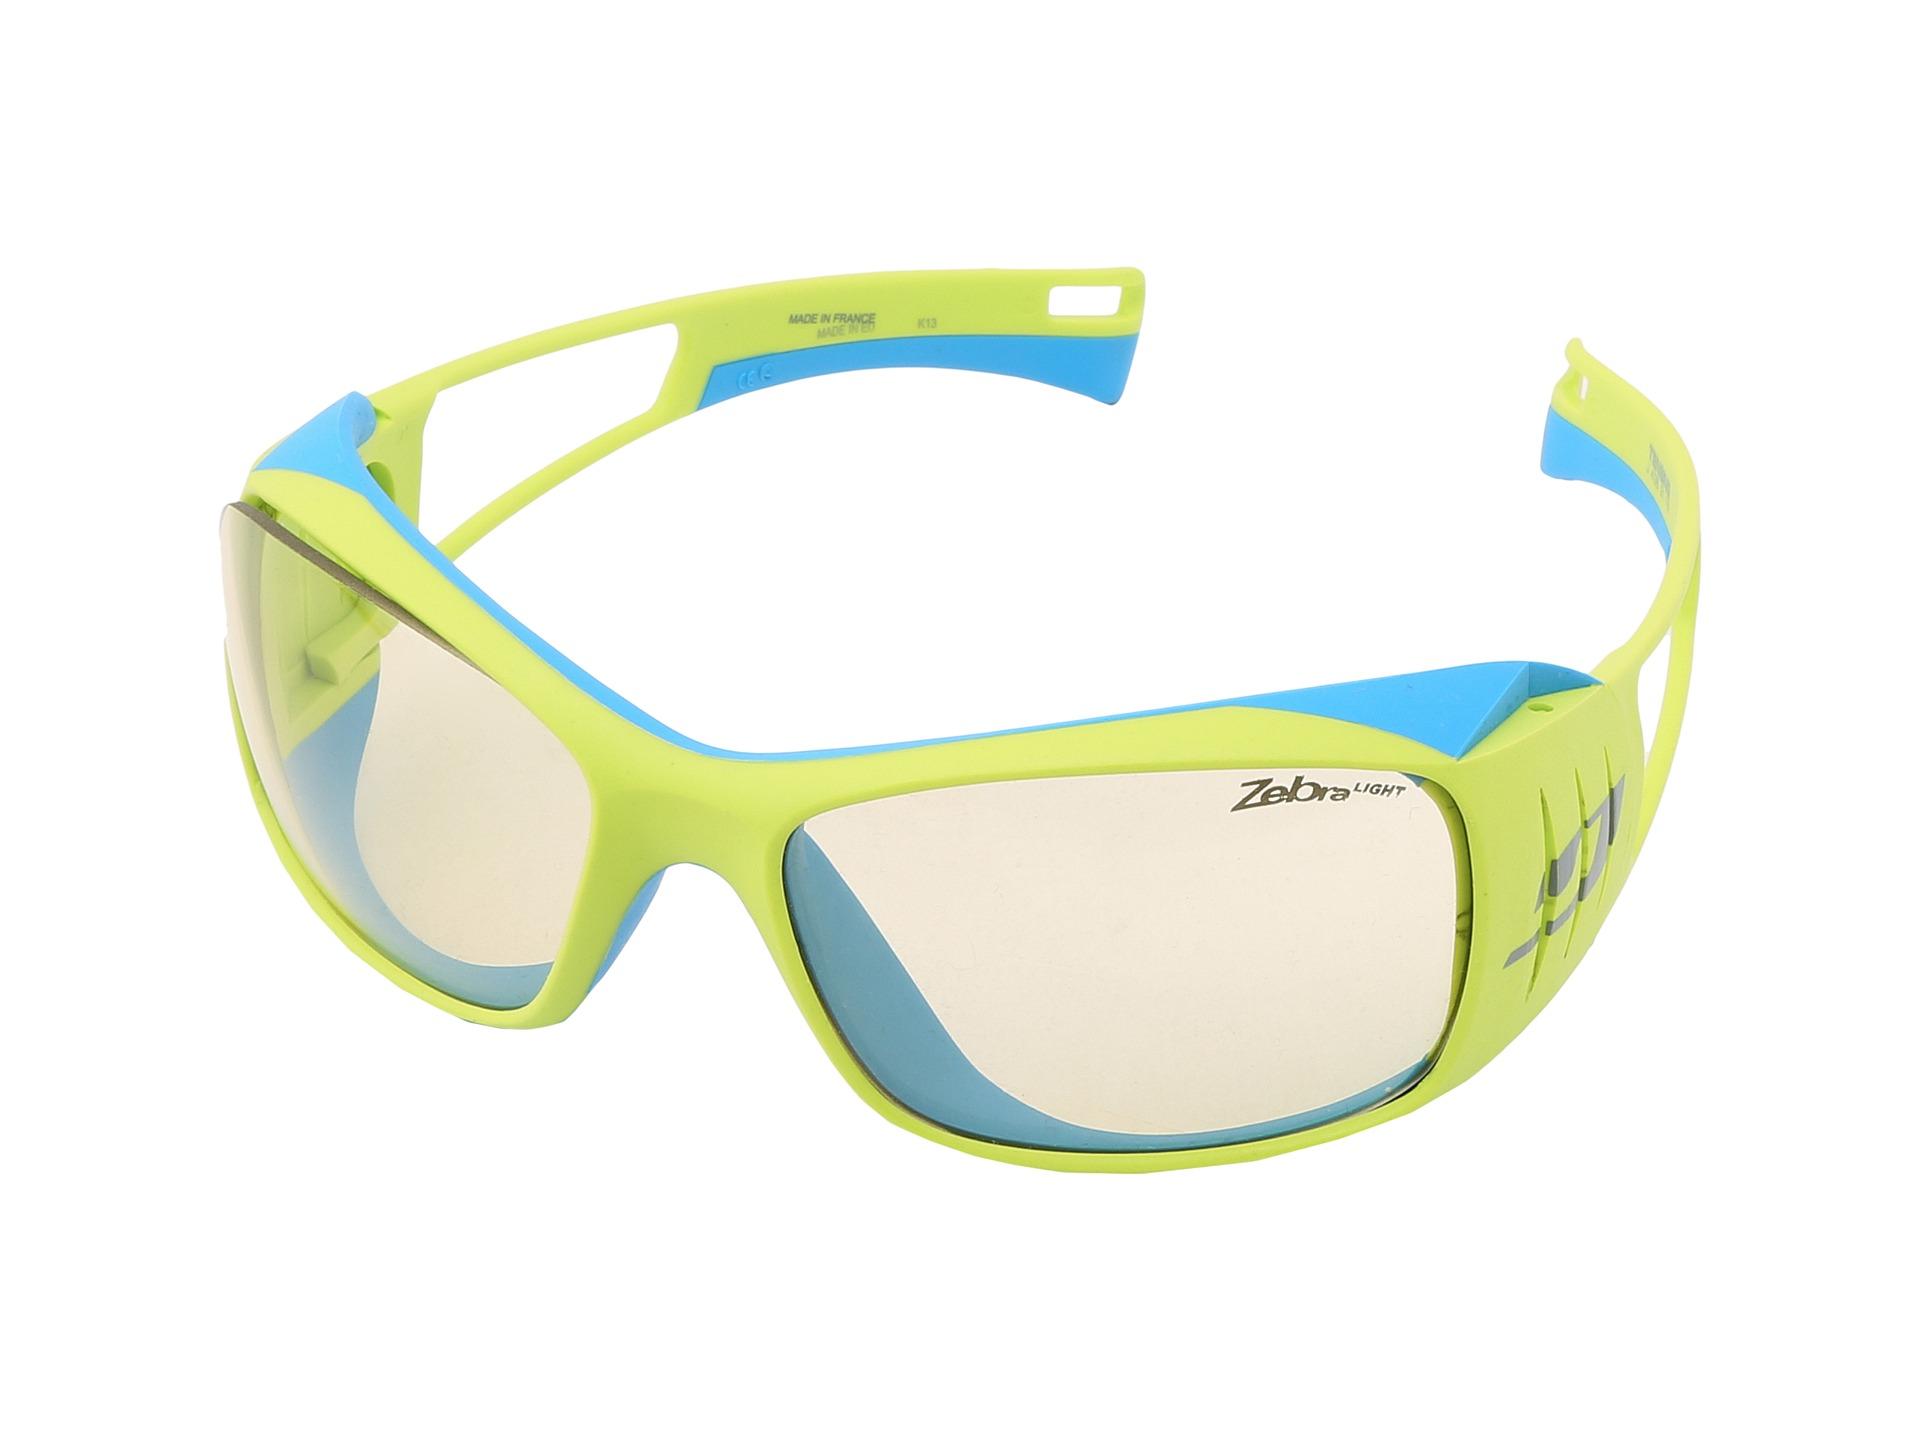 Glasses Frame Too Small : Polarized Interchangeable Sunglasses www.panaust.com.au